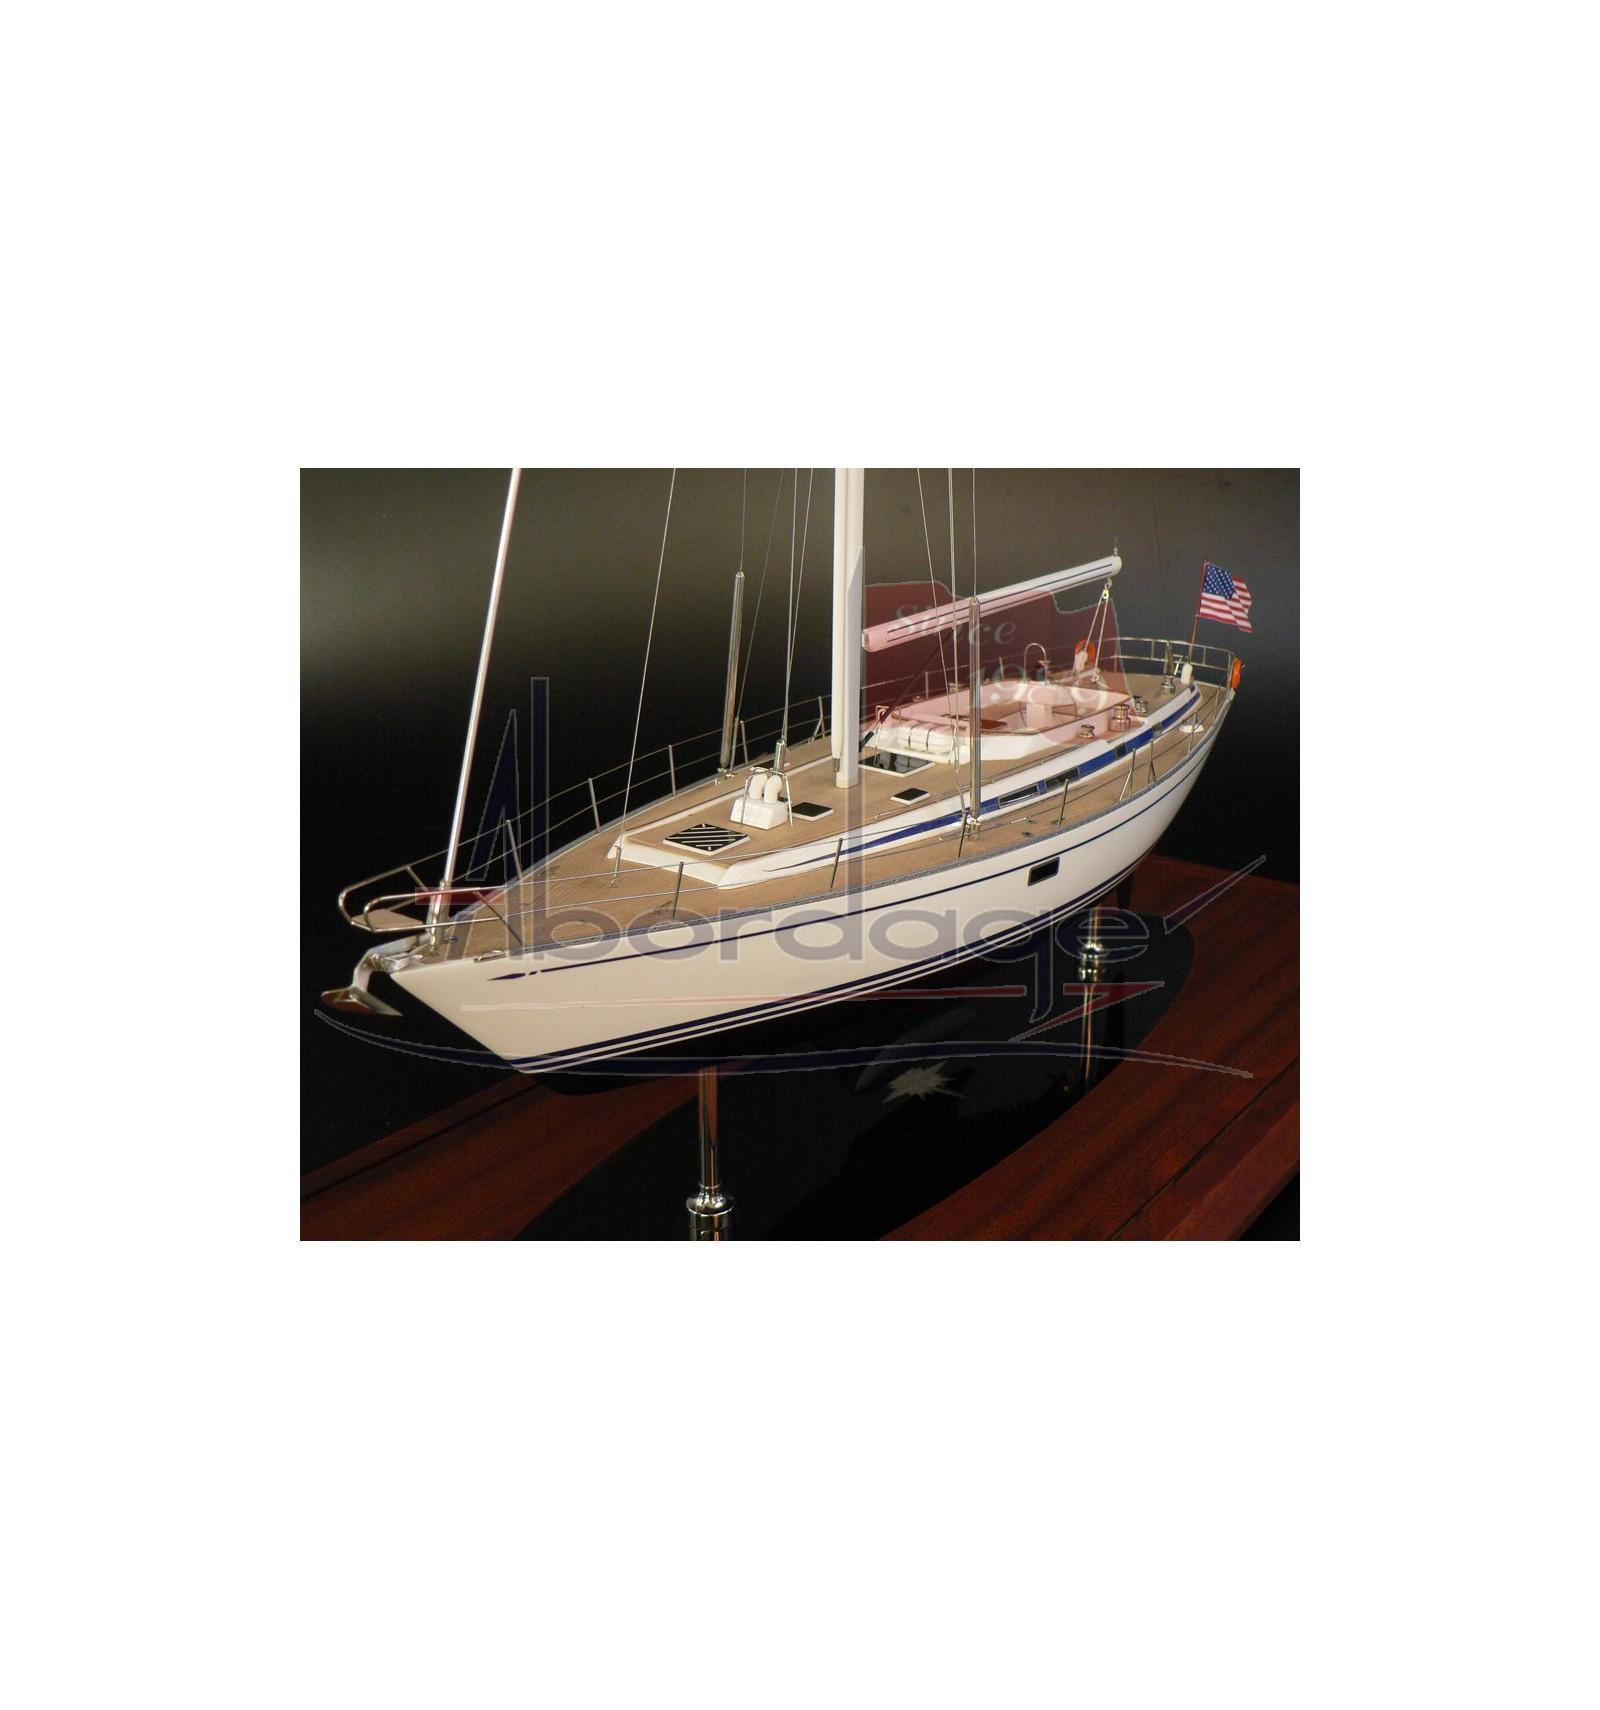 nautor swan 5557 boat model